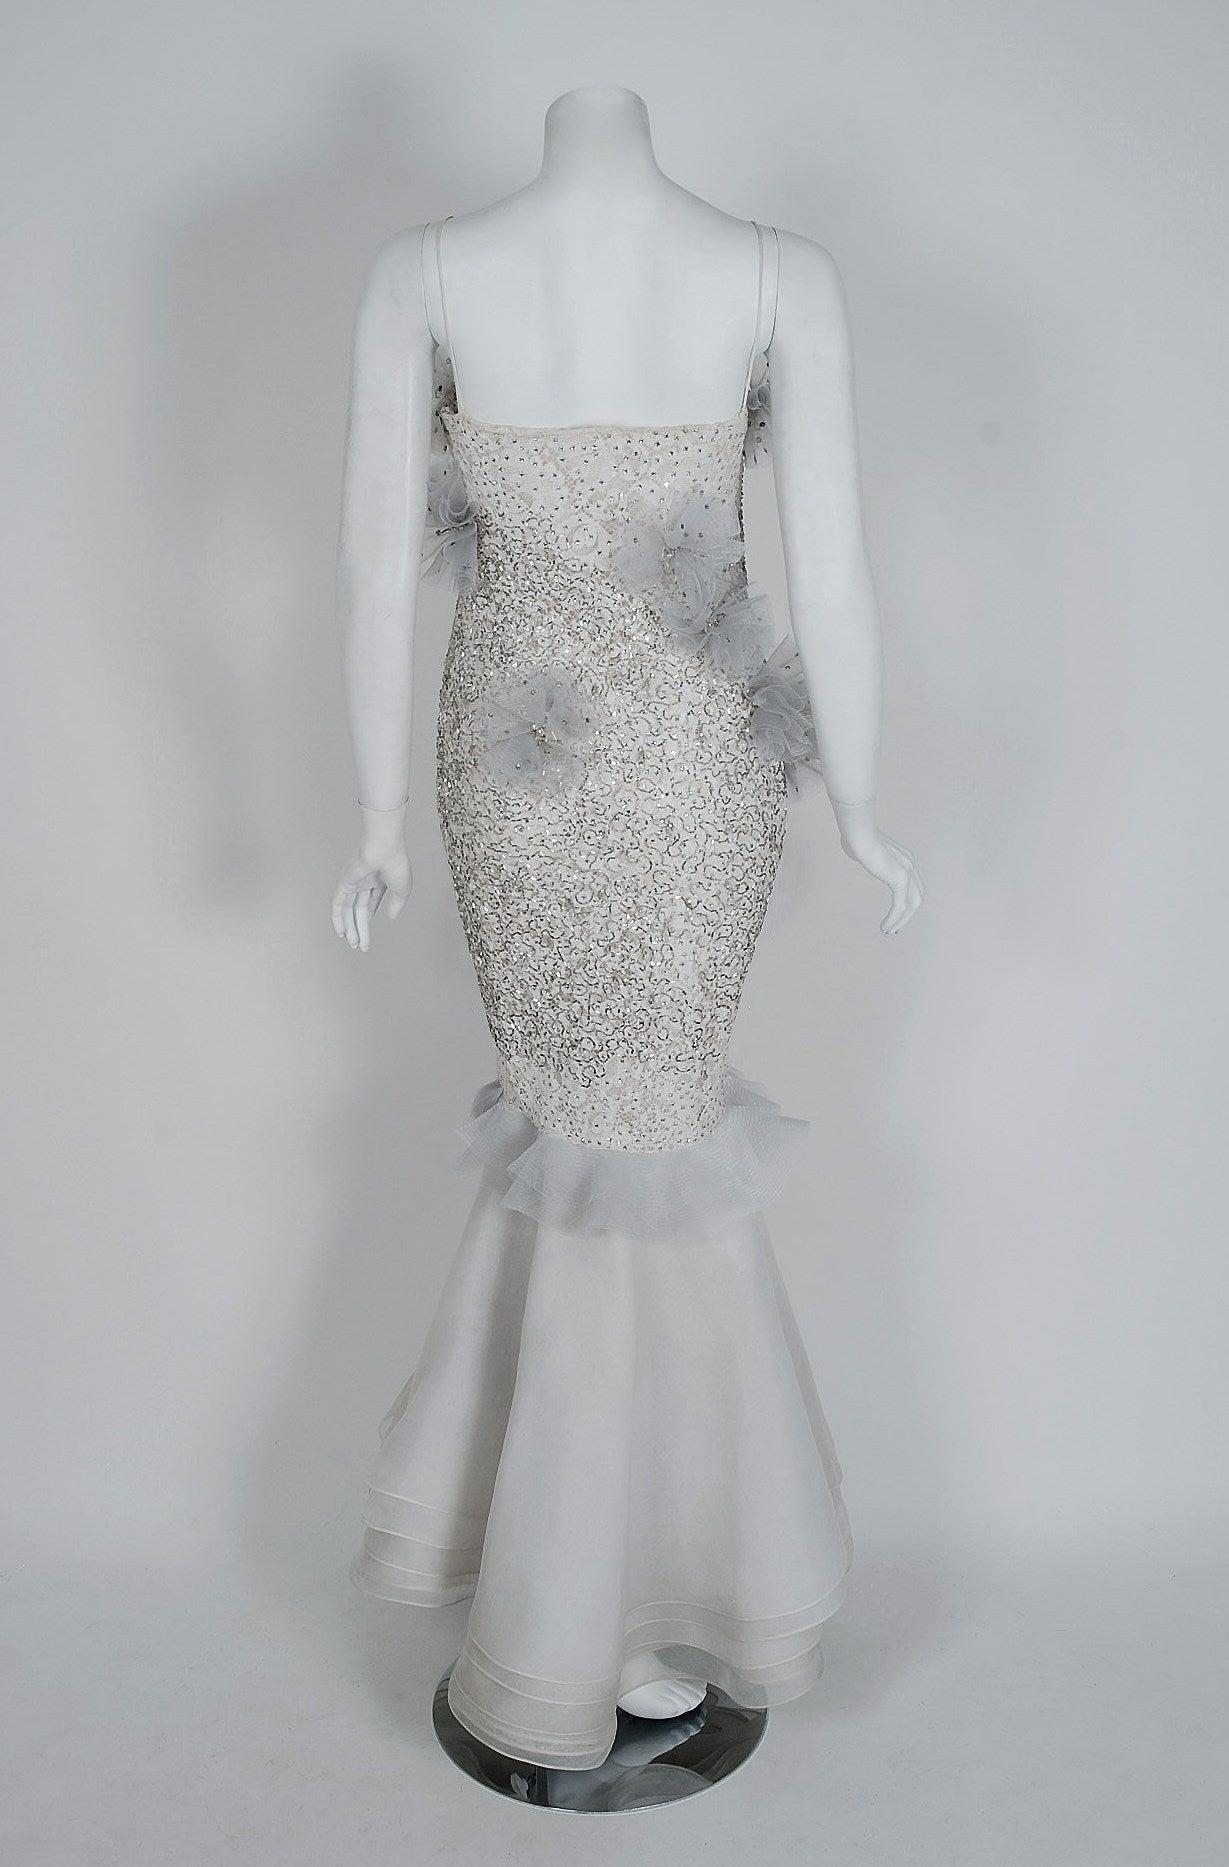 1955 Nina Ricci Paris Haute-Couture White Rhinestone Lace Silk Mermaid Gown For Sale 1